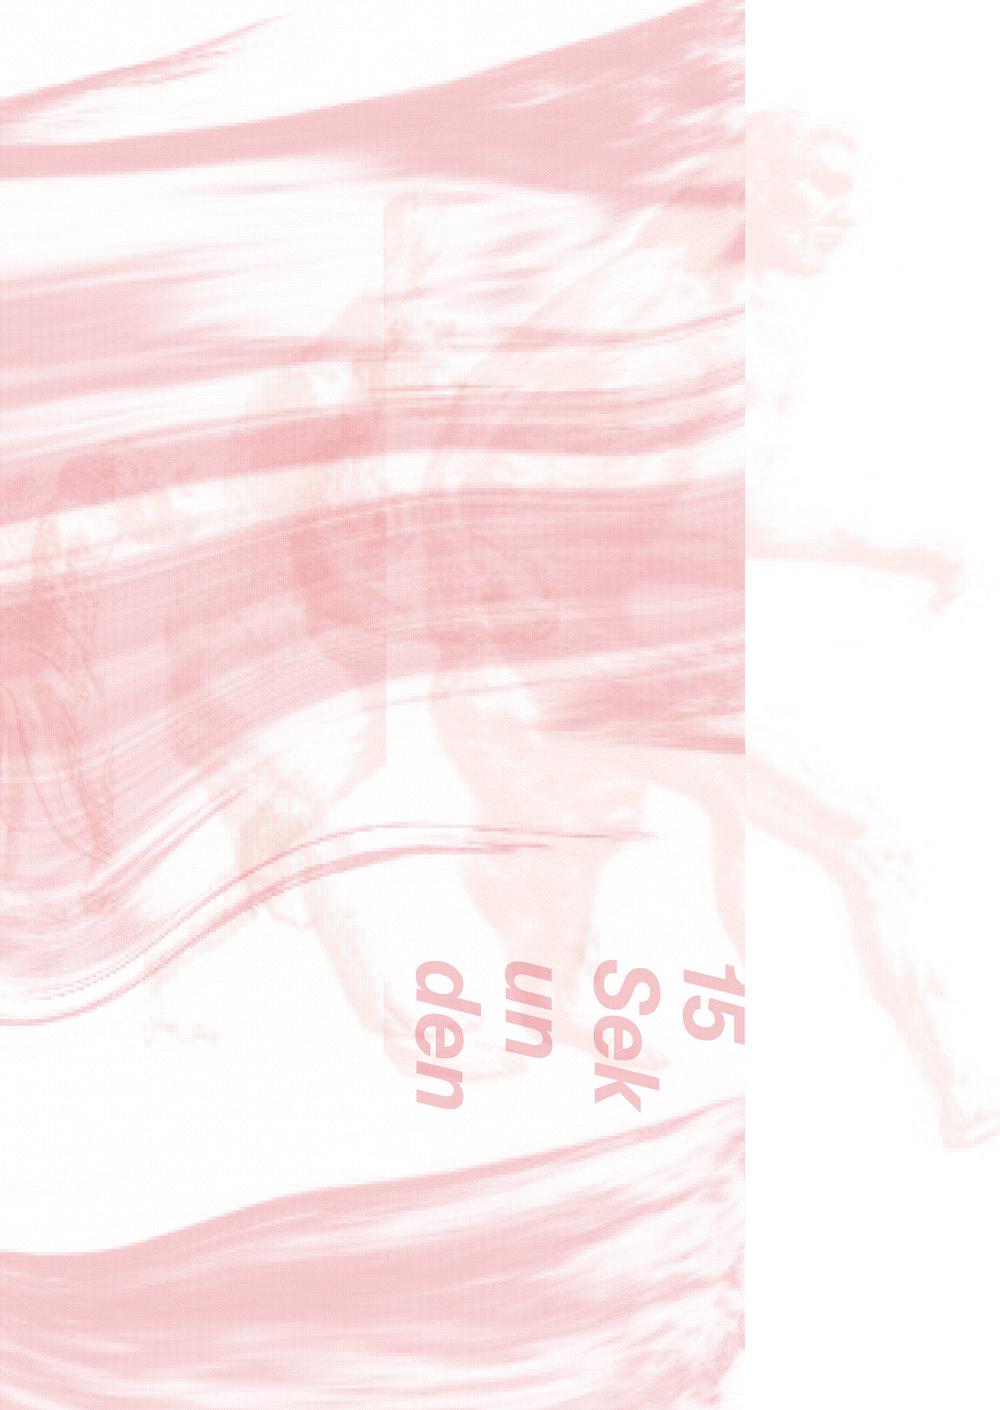 TRV_15Sekunden_Flyer_A6_front.jpg